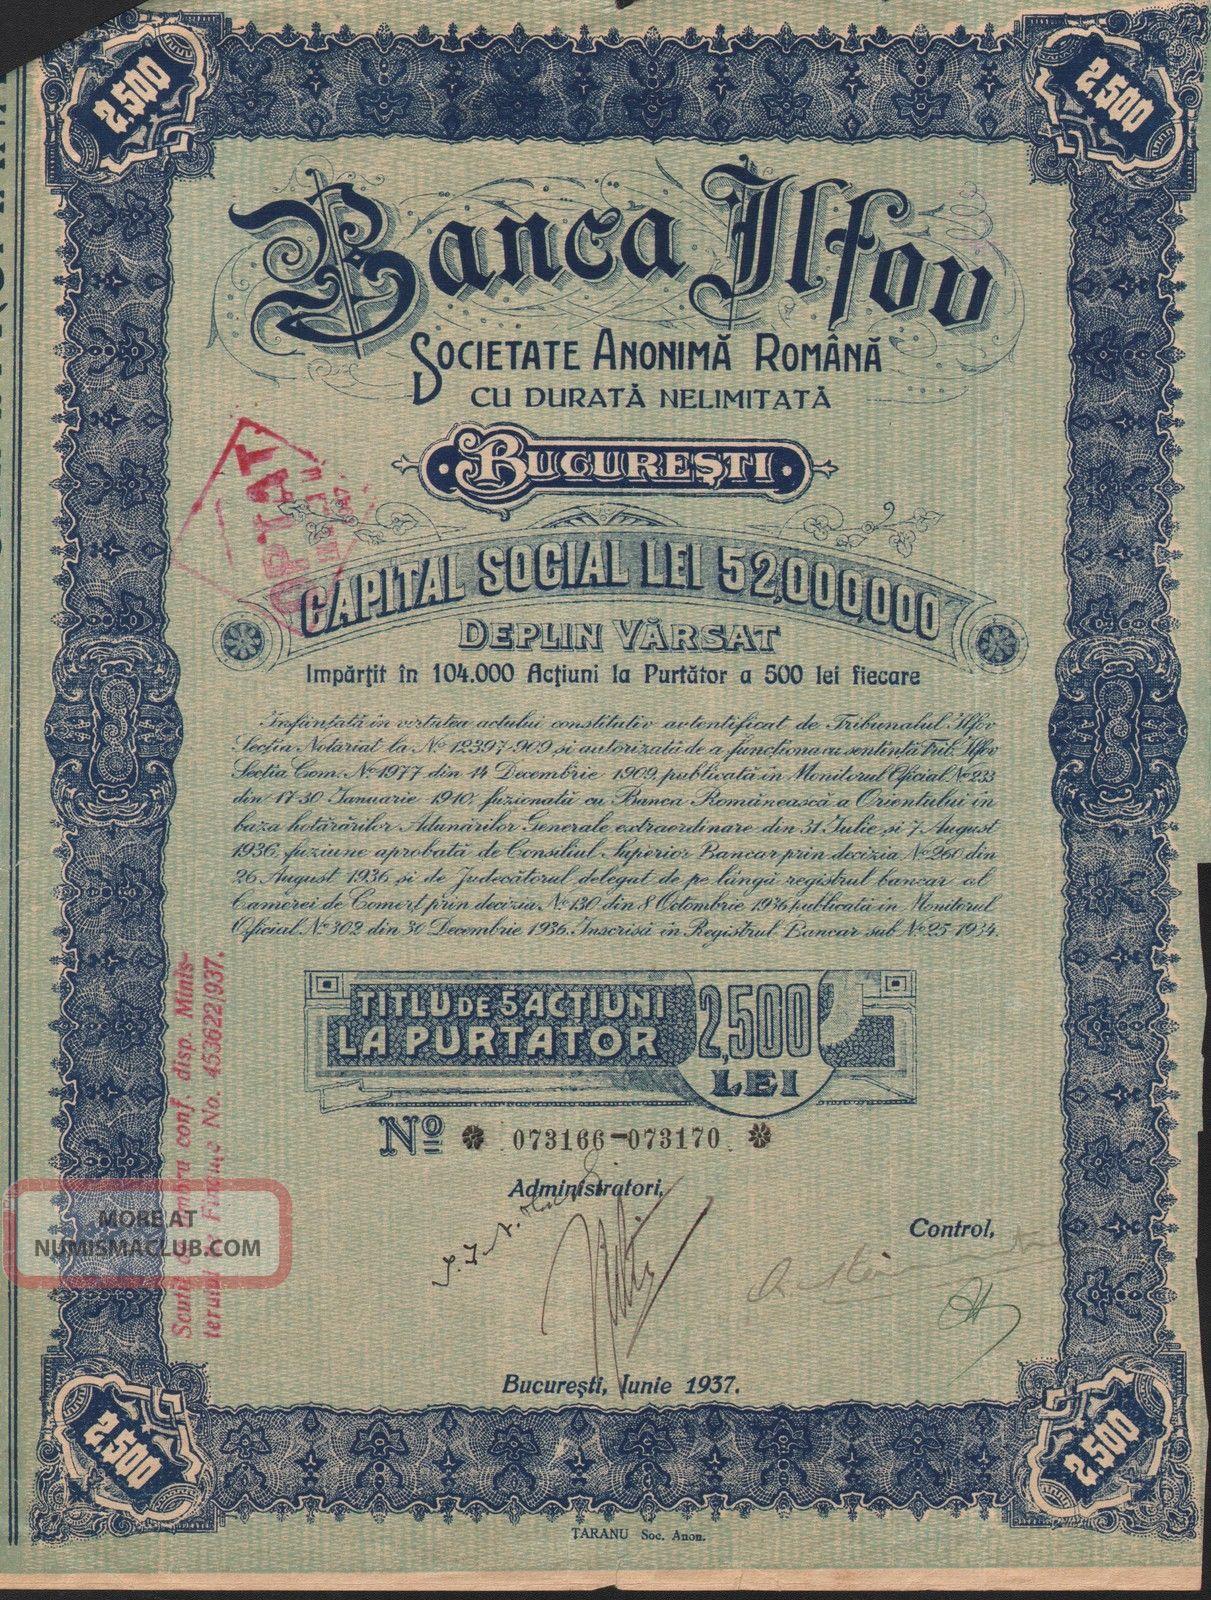 Romania Ilfov Bank Stock Certificate W/ 10 Coupons World photo